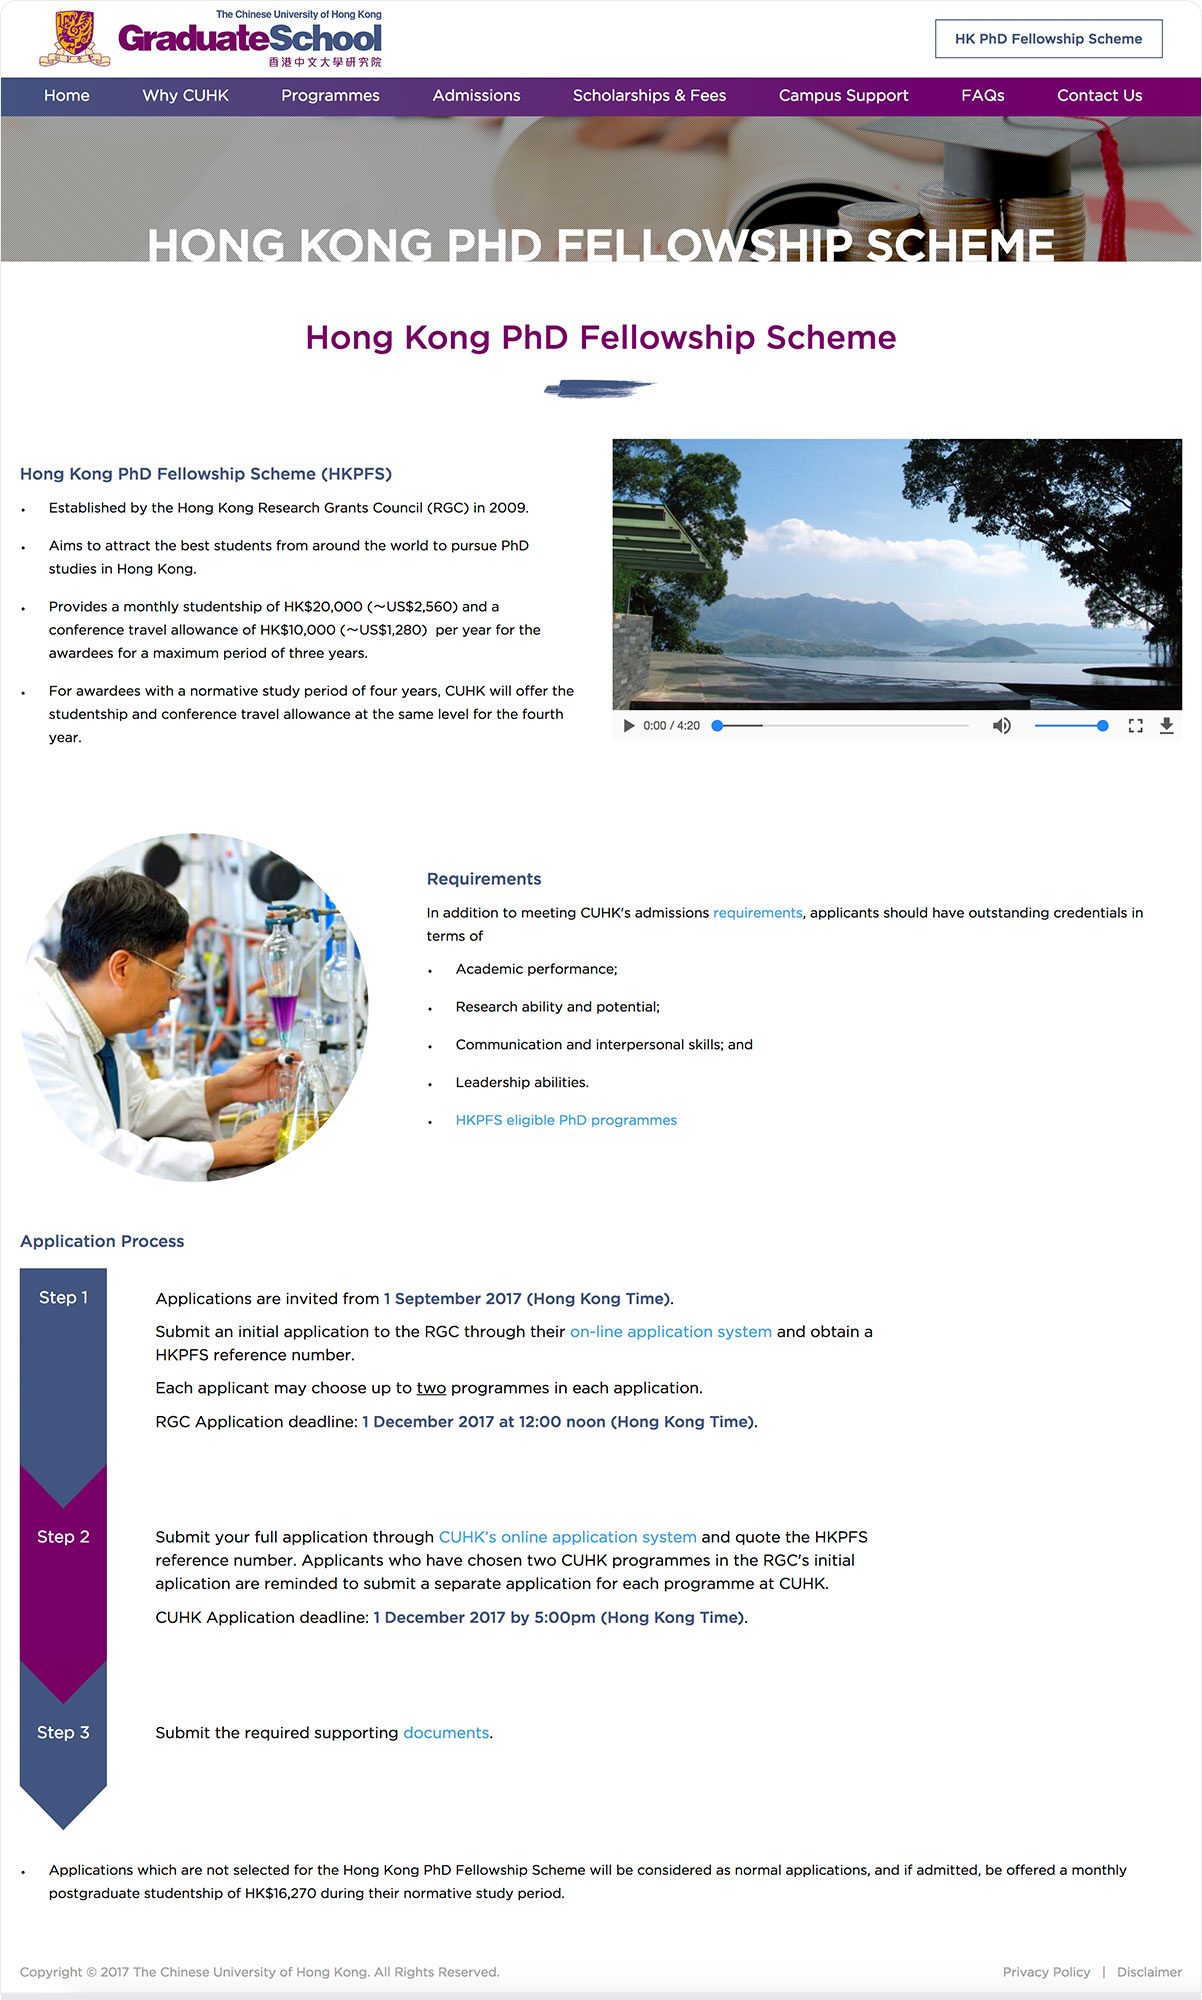 CUHK Graduate School | Postgraduate Admissions